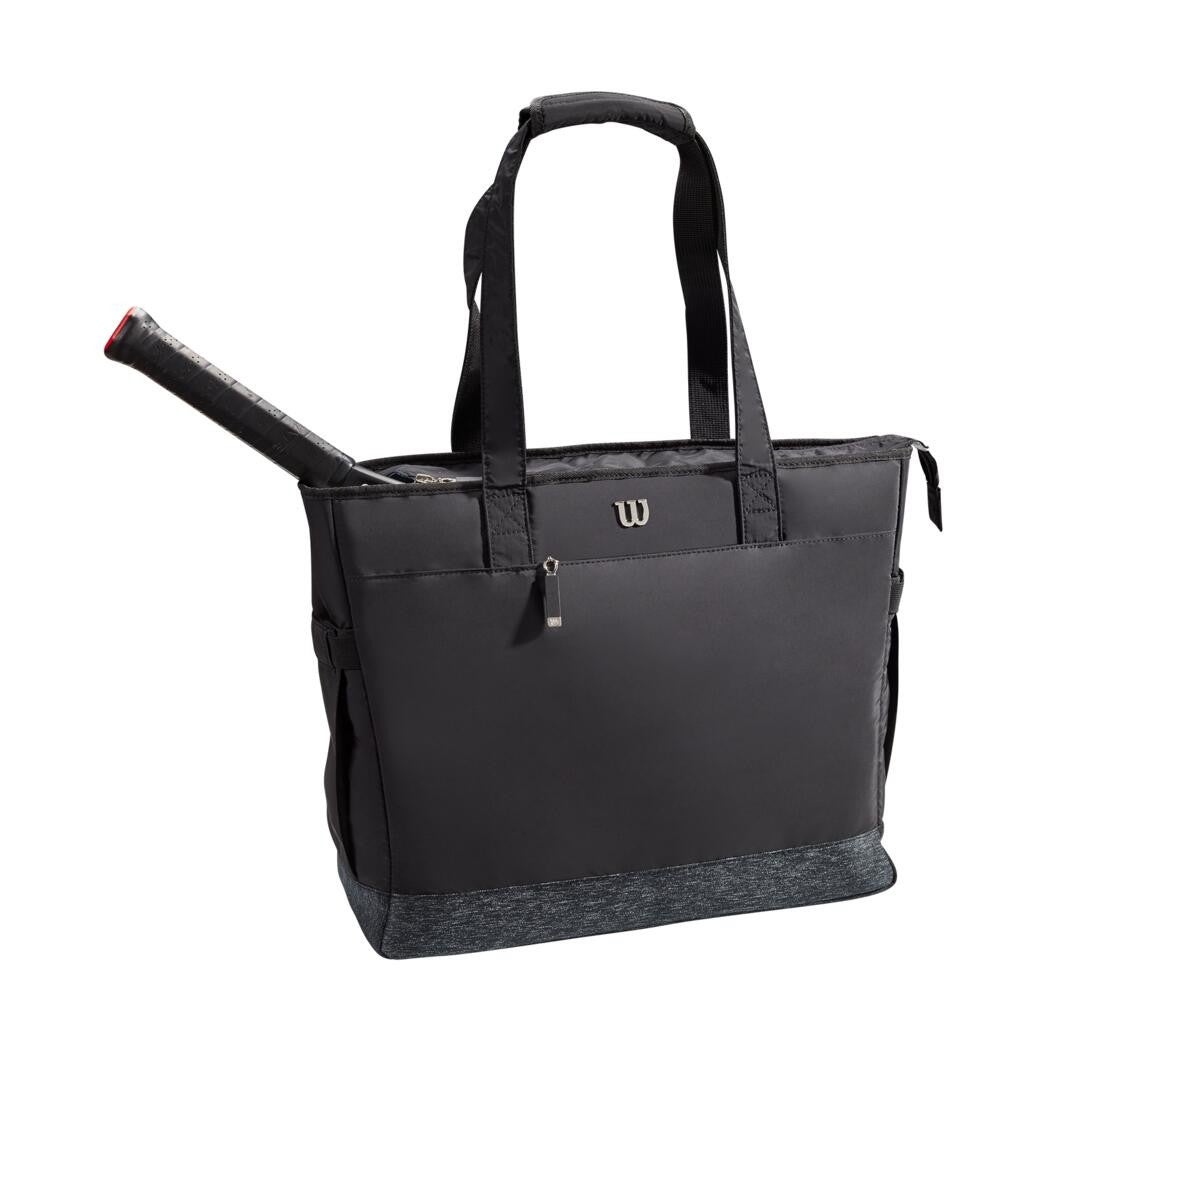 Wilson Tote Bag